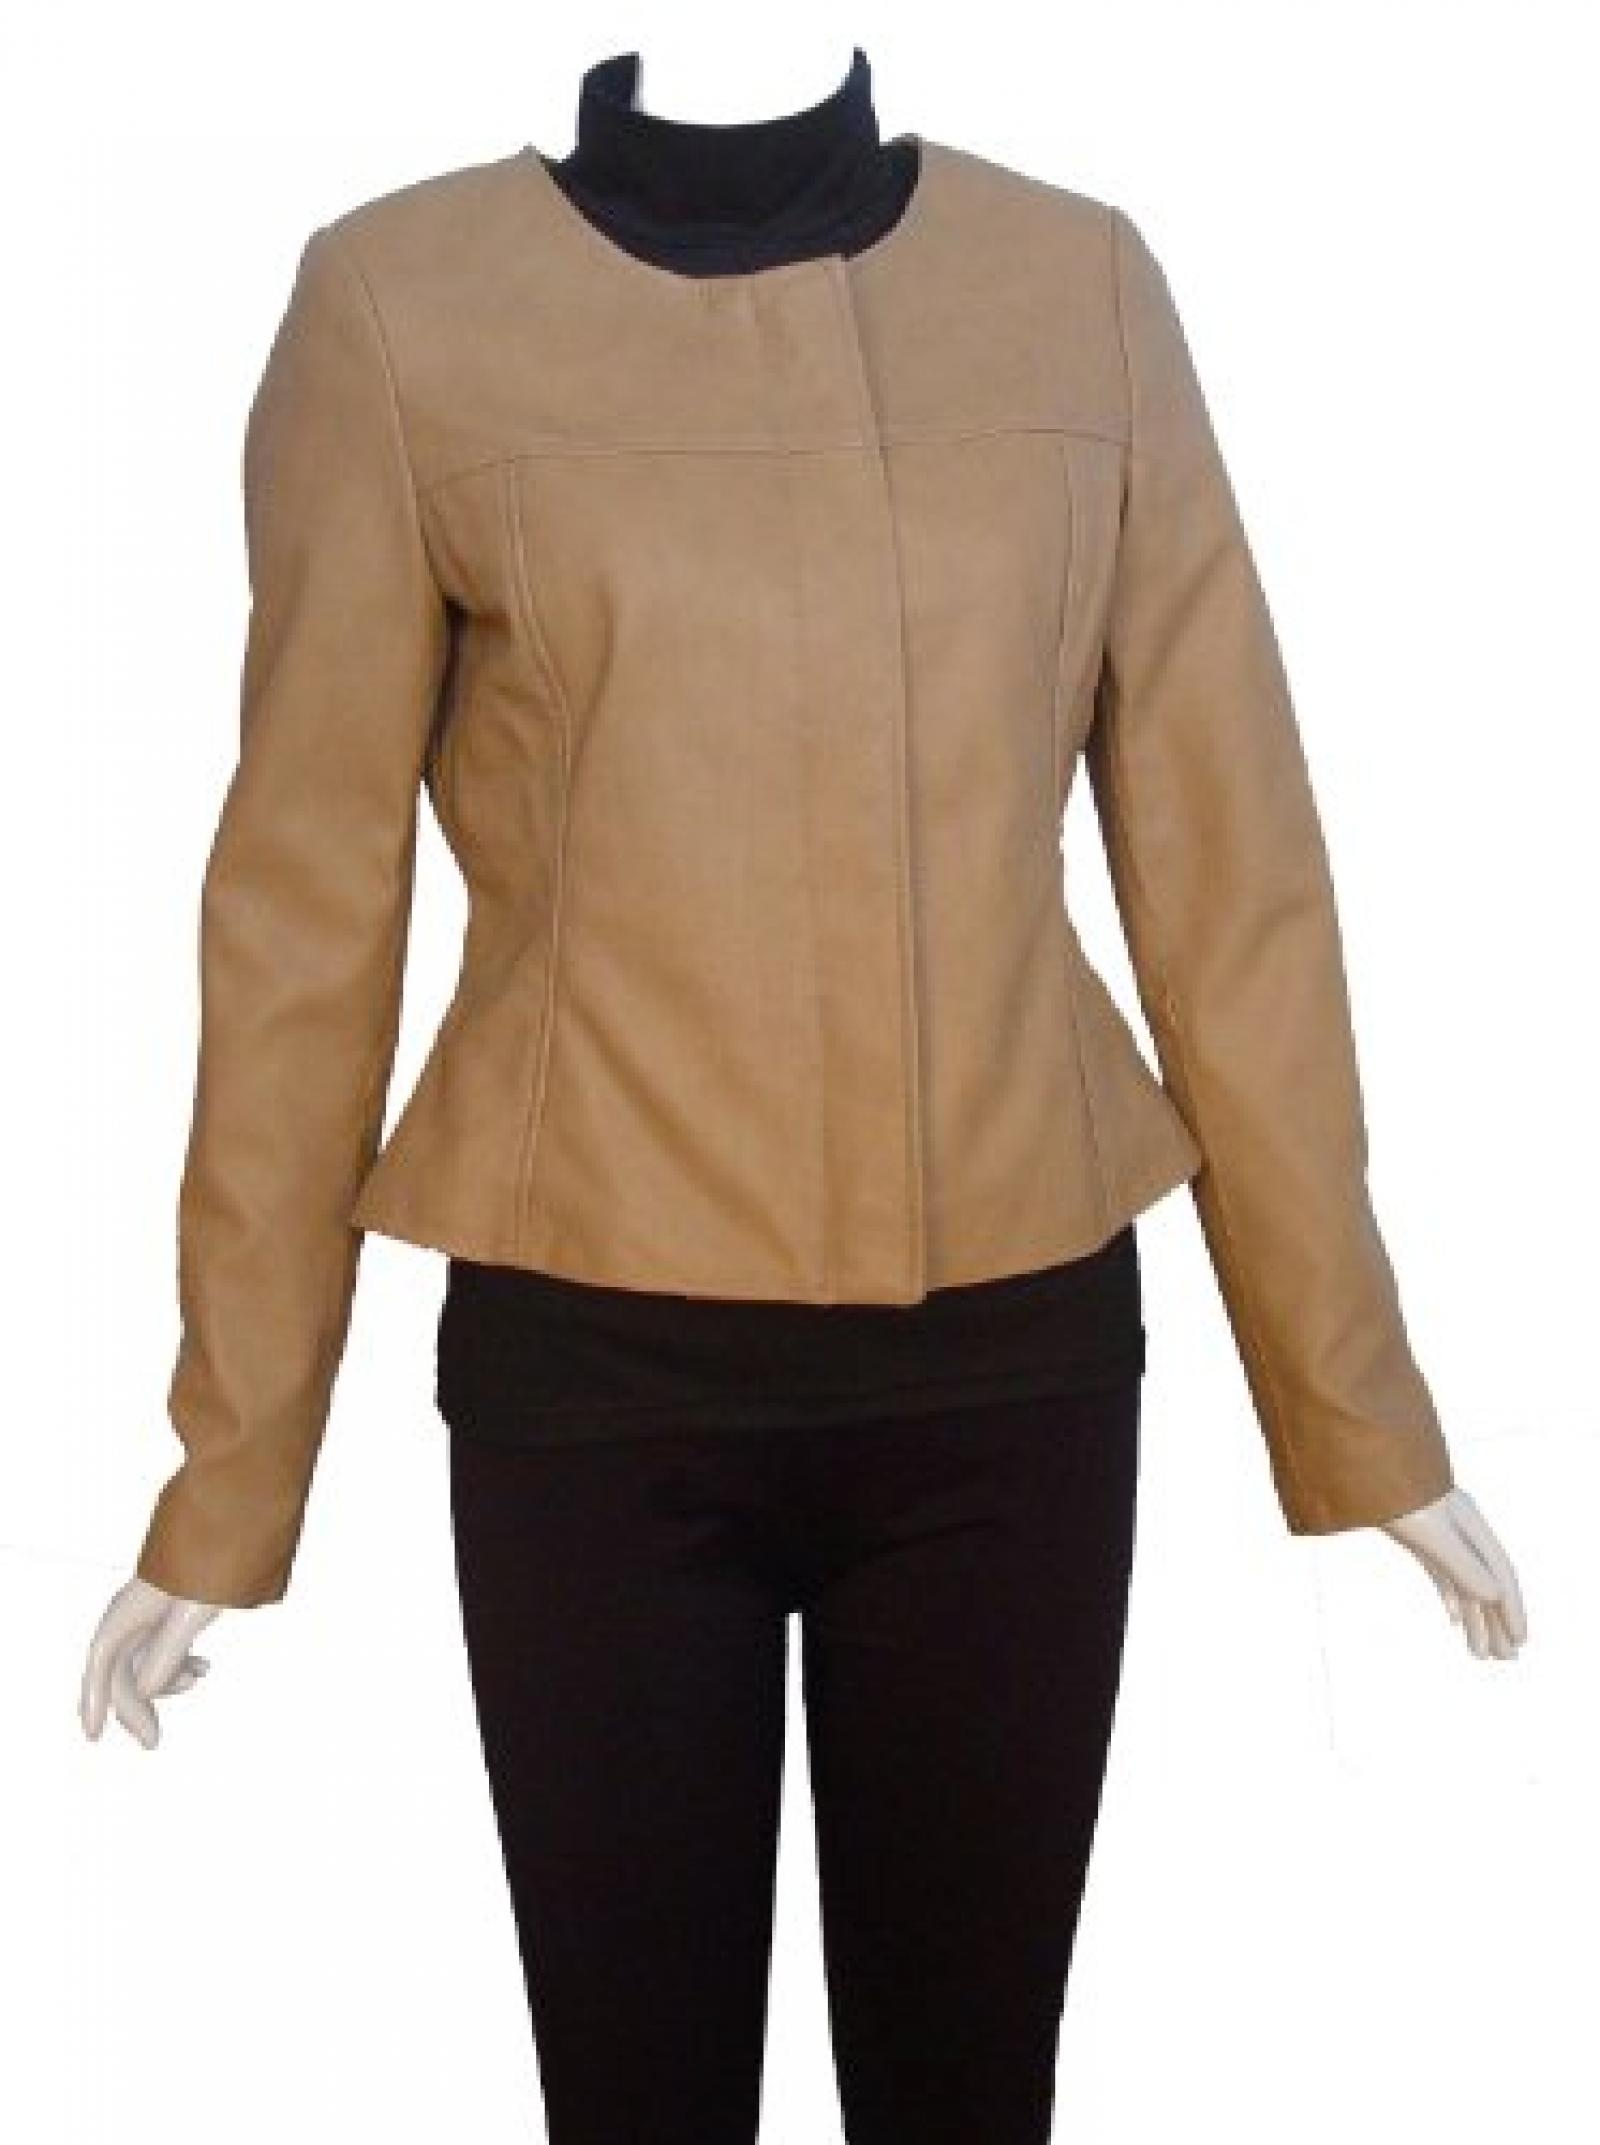 Nettailor FREE tailoring Women PLUS SIZE 4066 Leather Moto Jacket Collarless